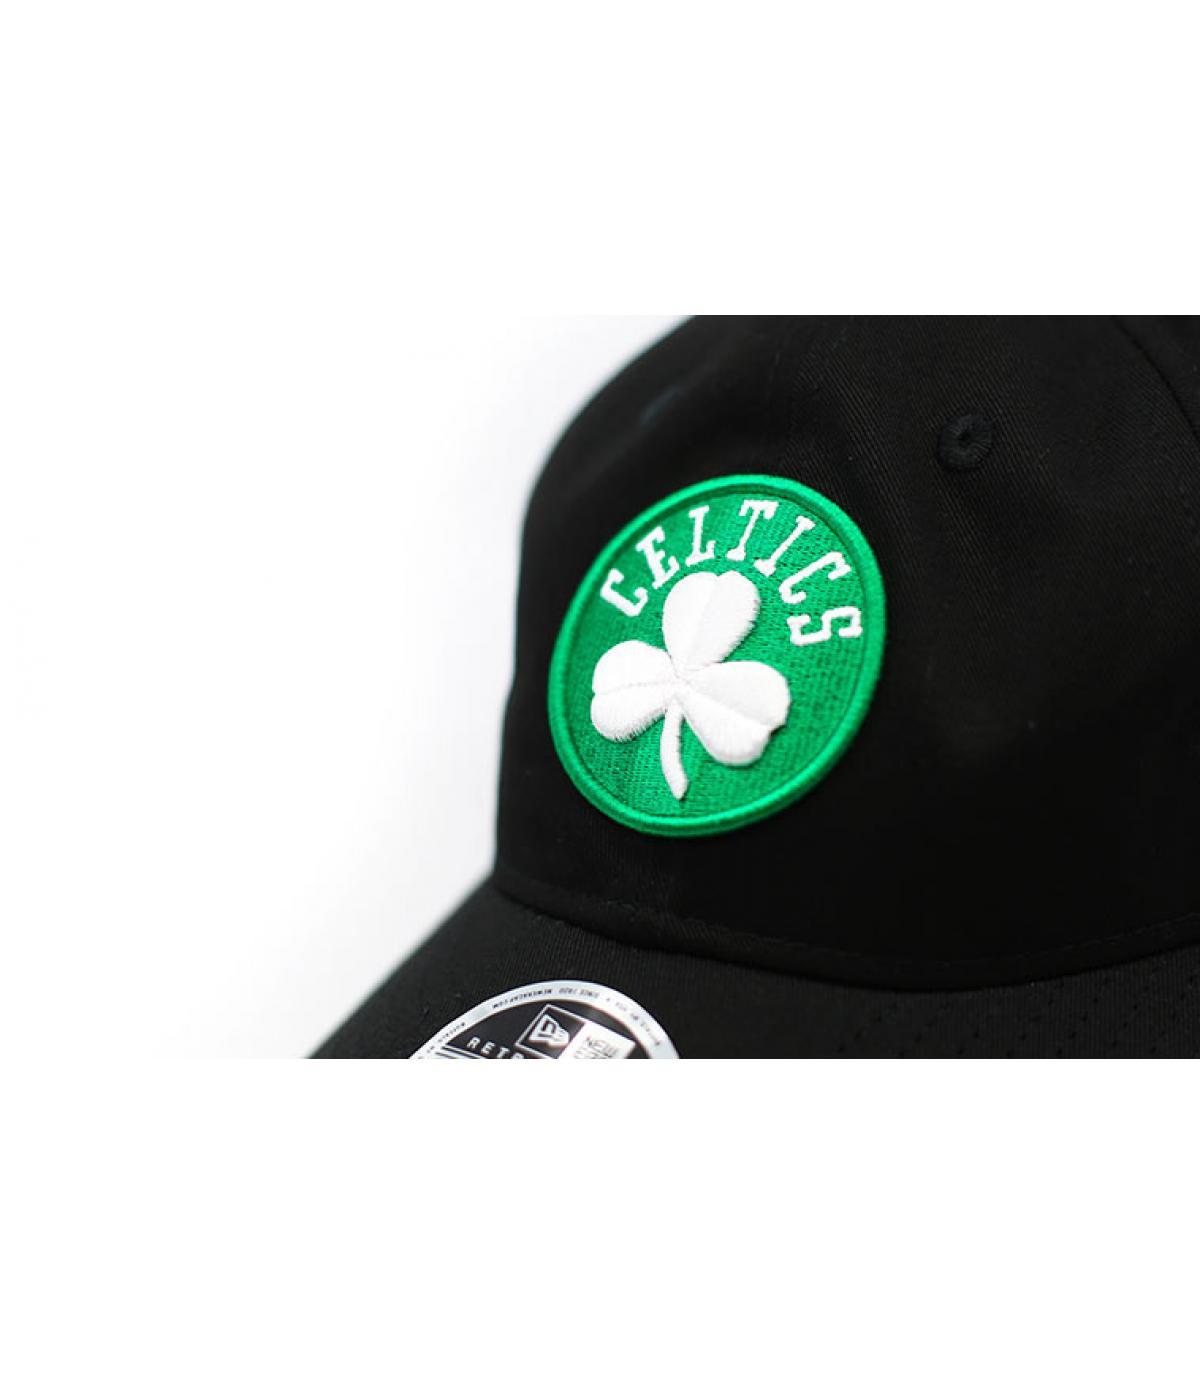 Details Snapback NBA Retro Crown 9Fifty Celtics - Abbildung 3